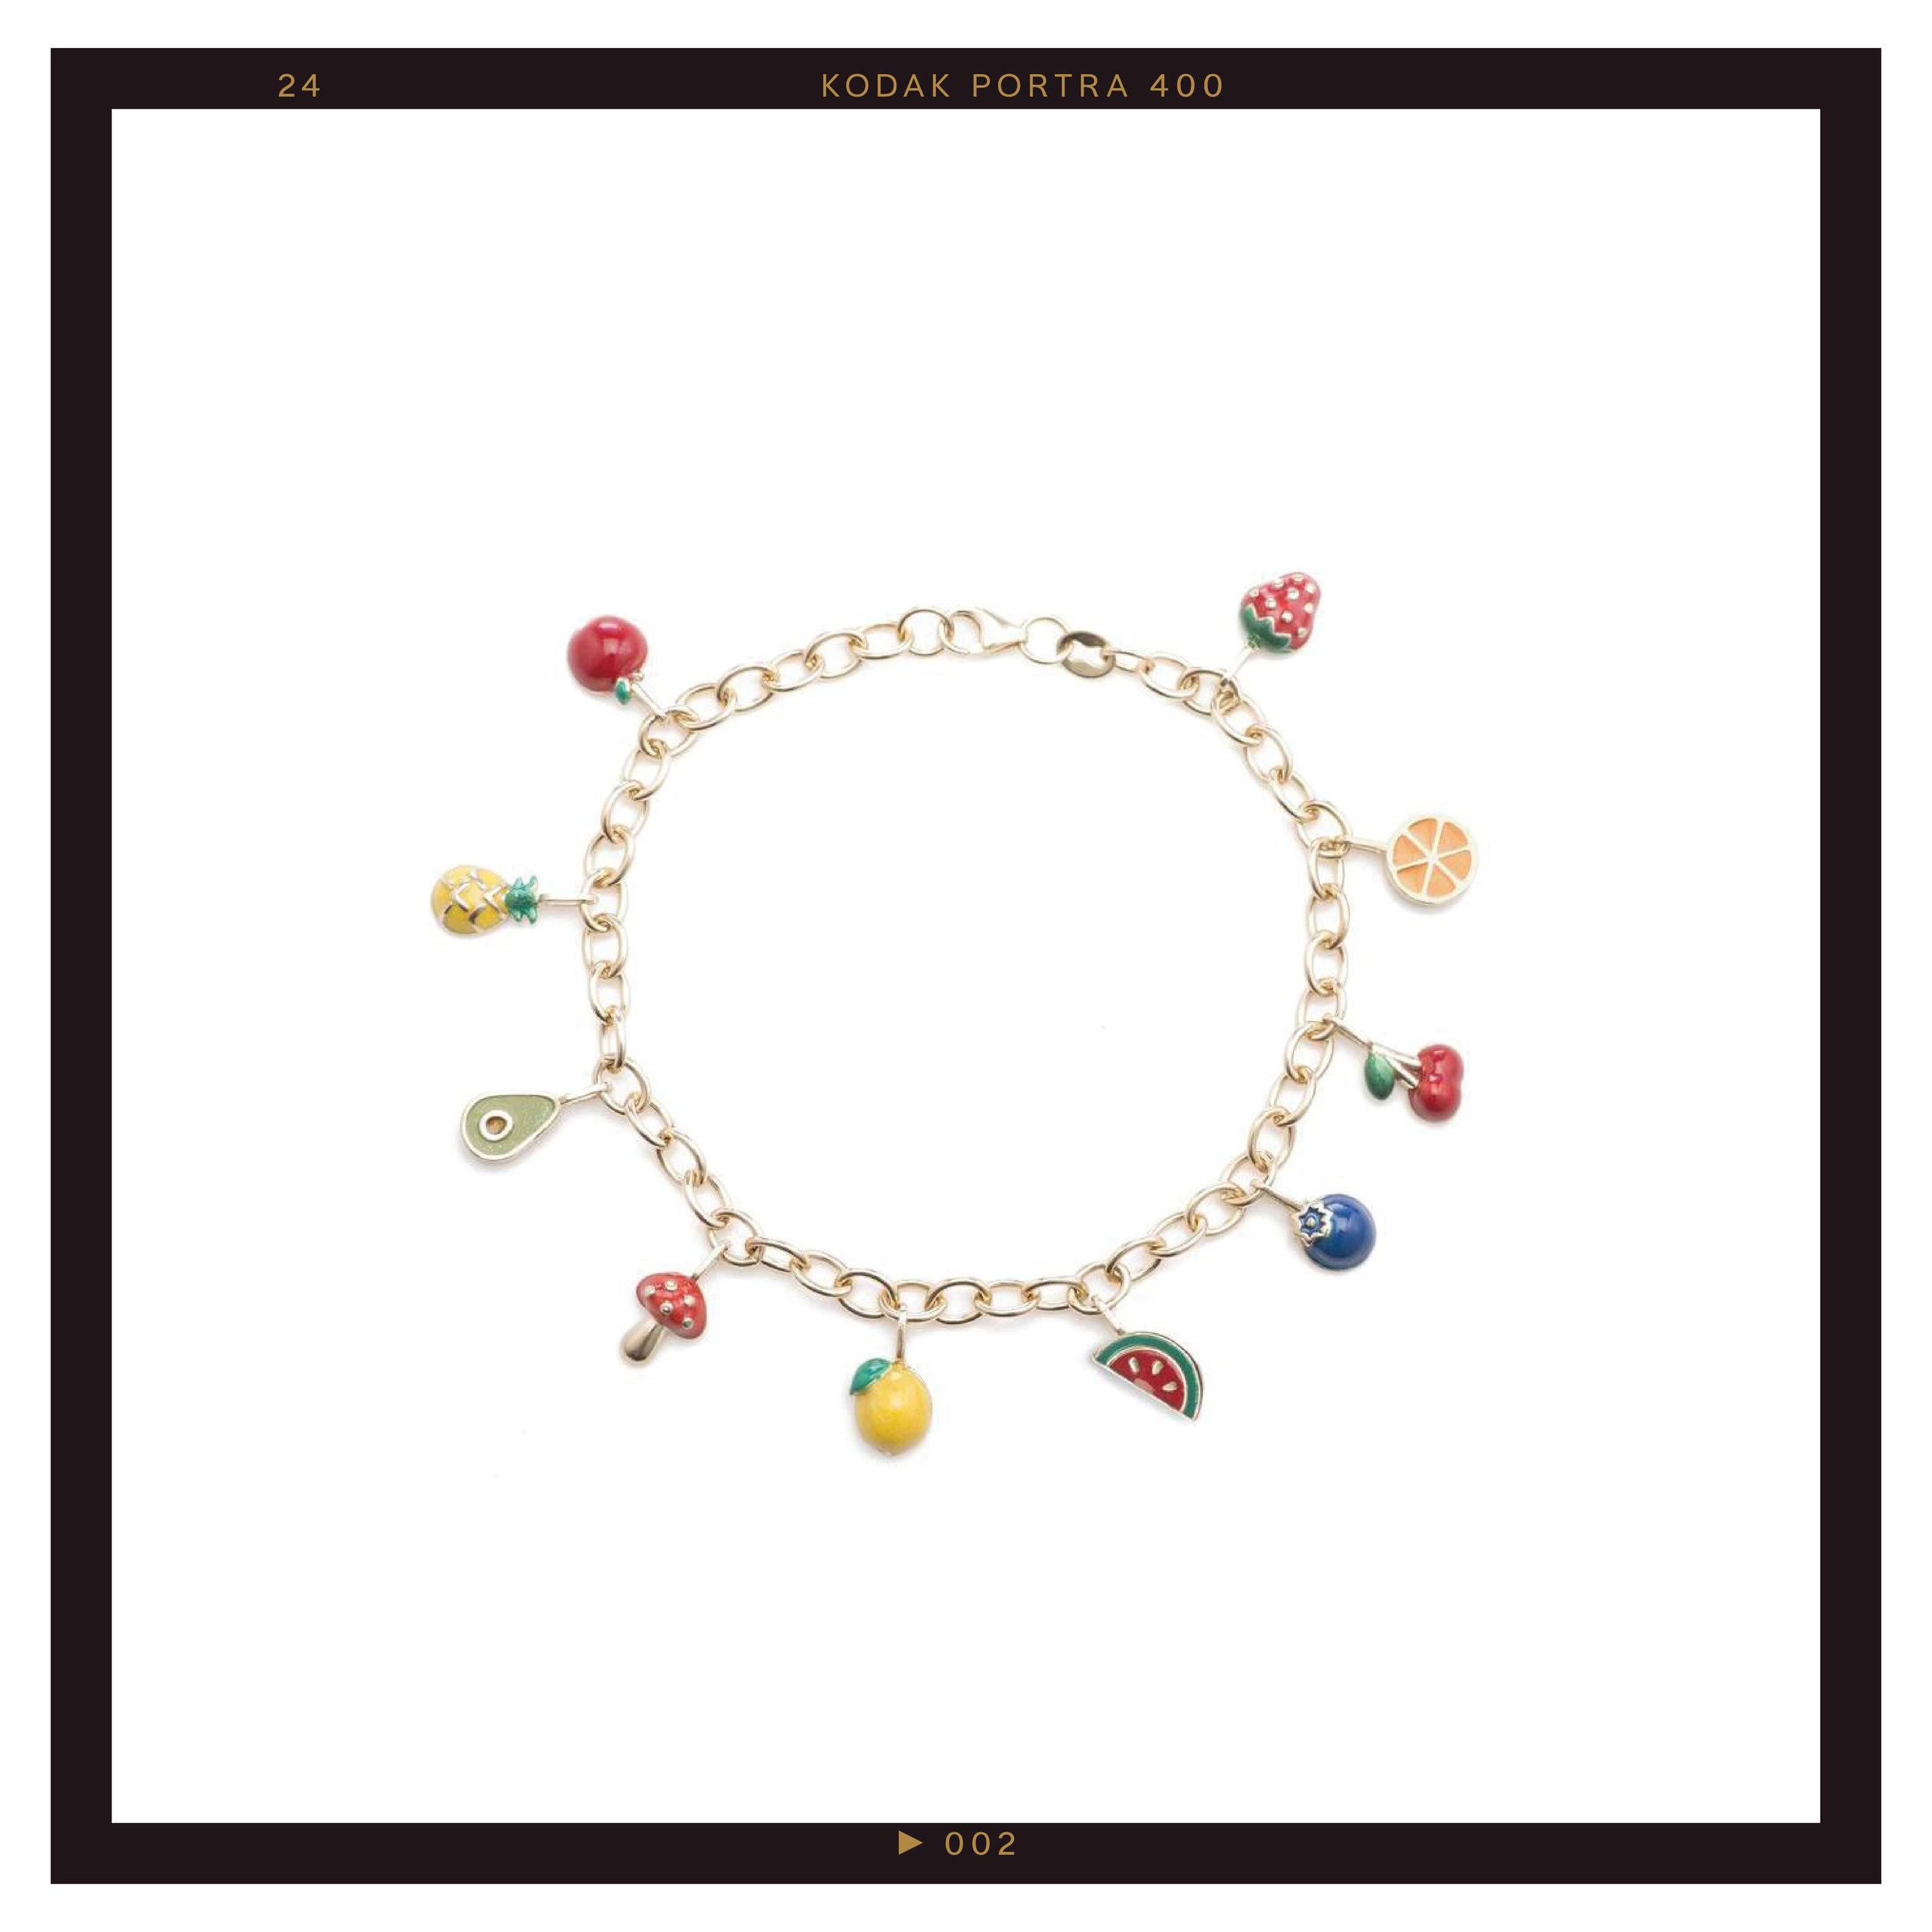 Ariel Gordon Frutta Charm Bracelet ($3500)